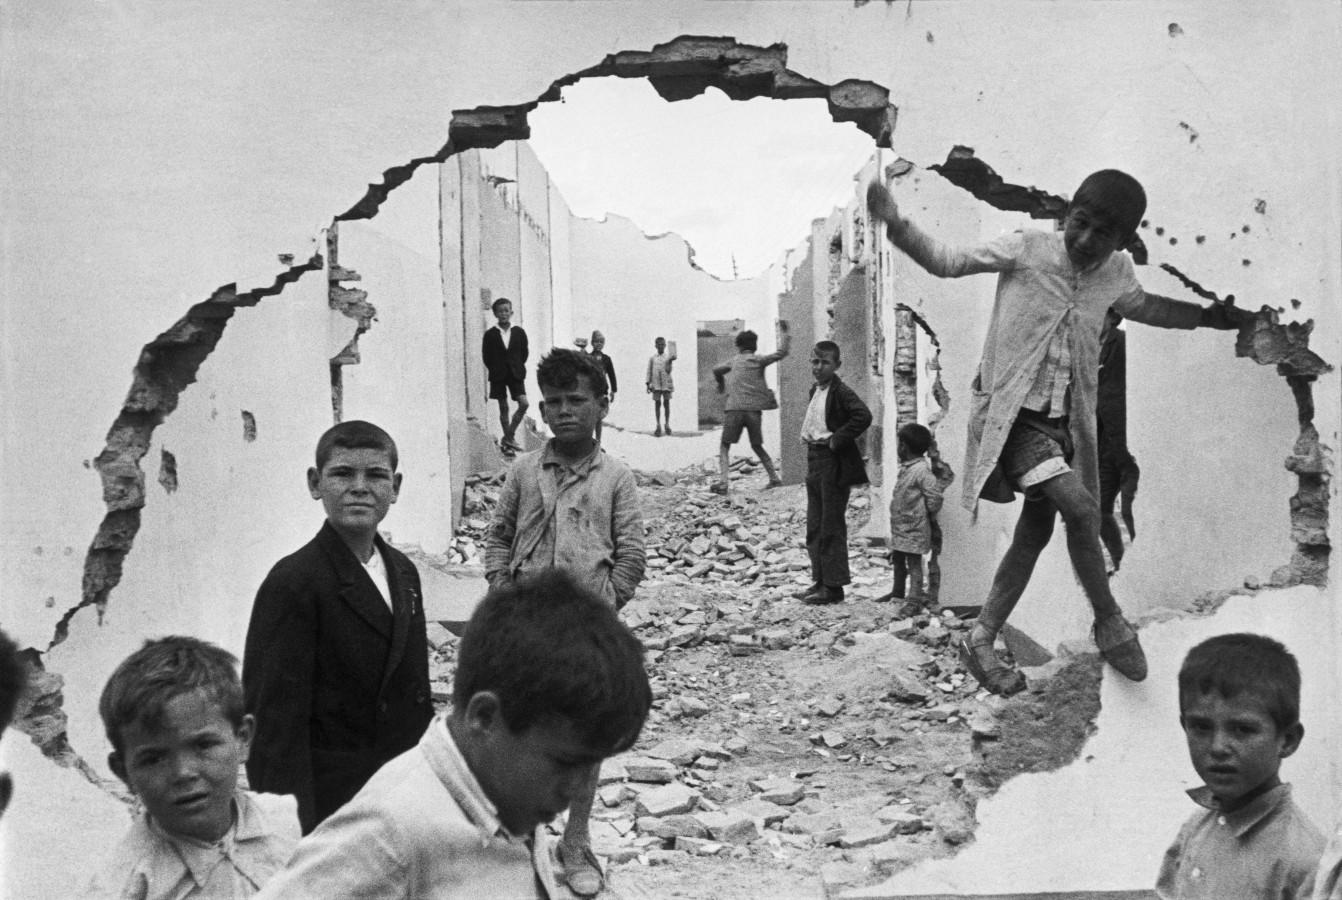 Henri Cartier-Bresson - Seville